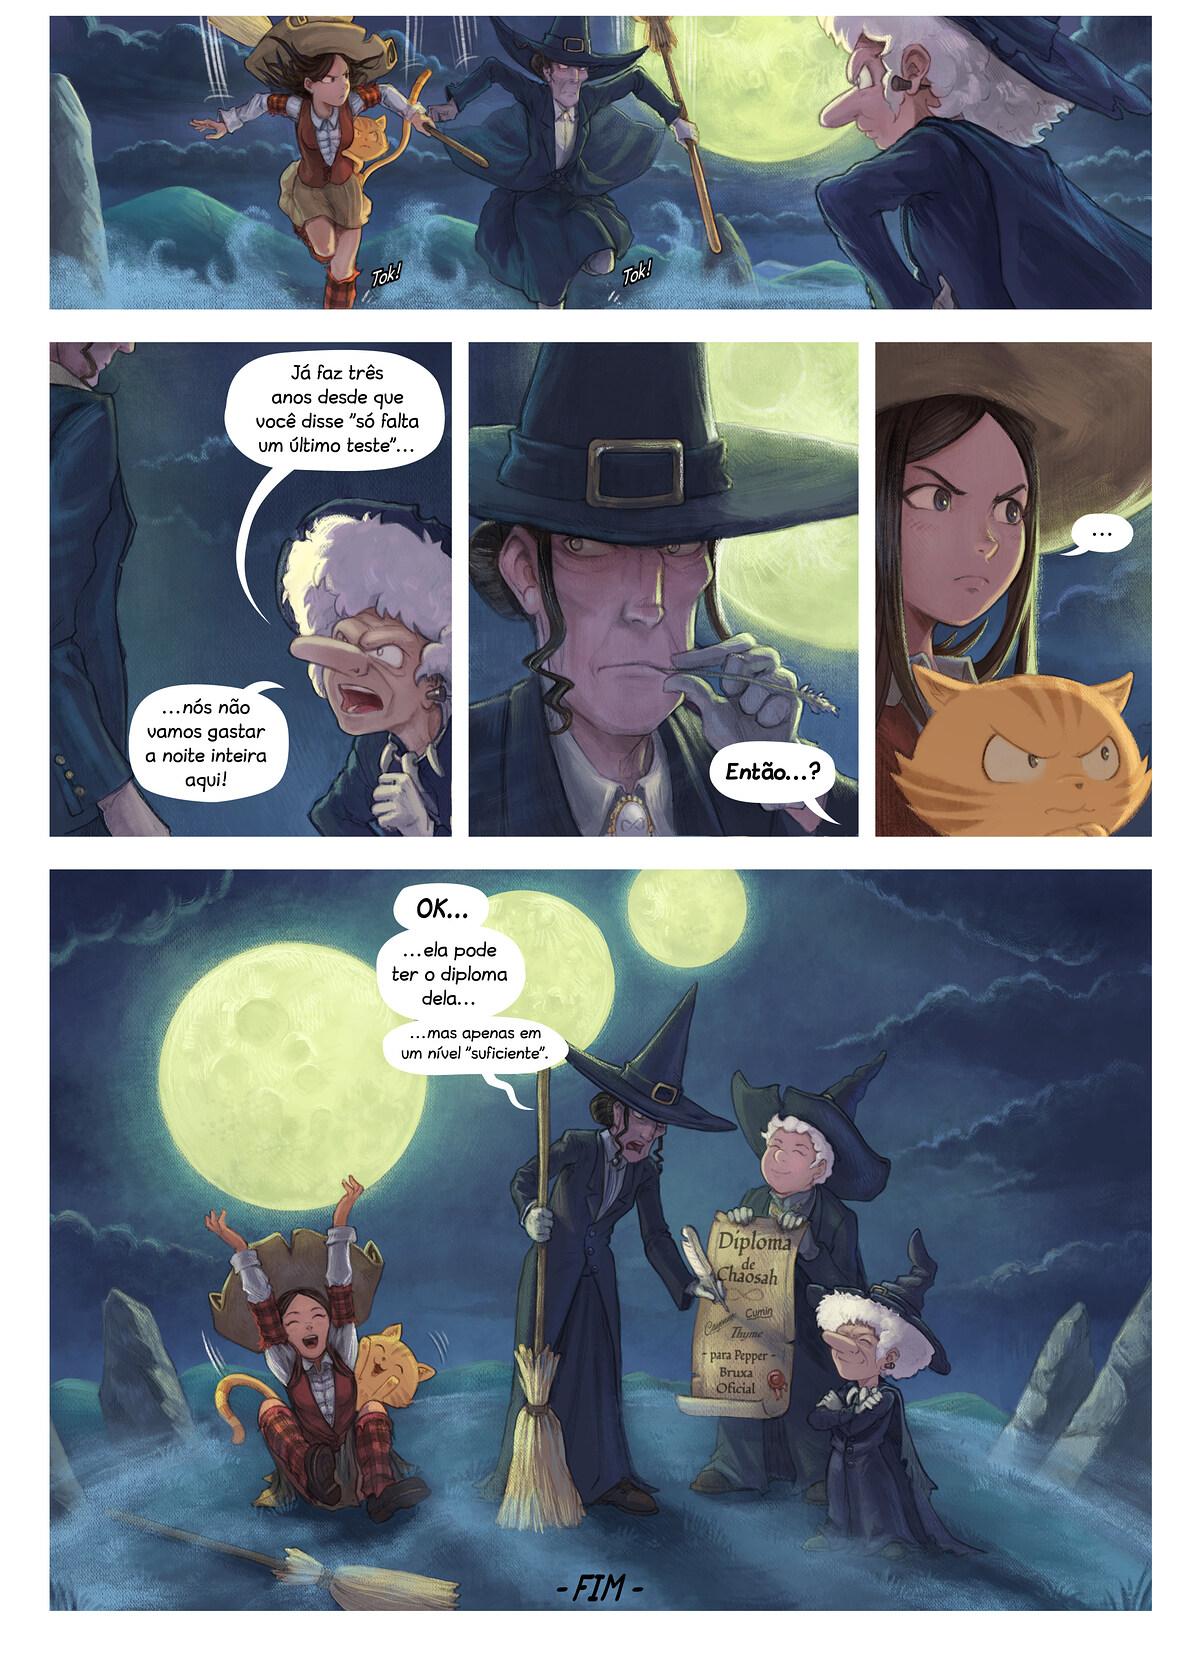 A webcomic page of Pepper&Carrot, episódio 31 [pt], página 7